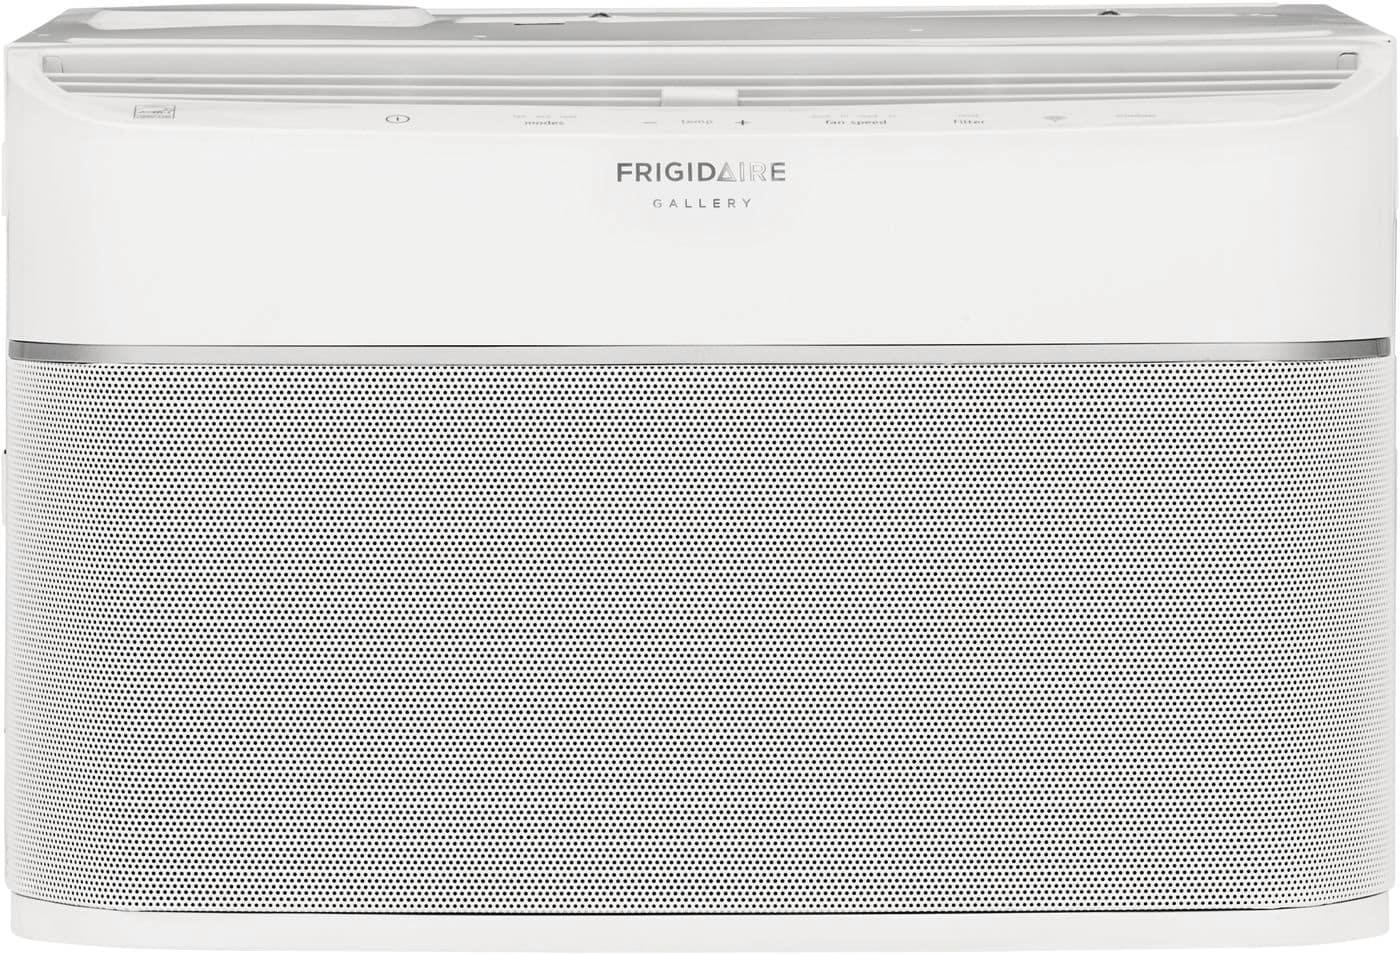 Frigidaire 6,000 BTU Cool Connect Smart Room Air Conditioner